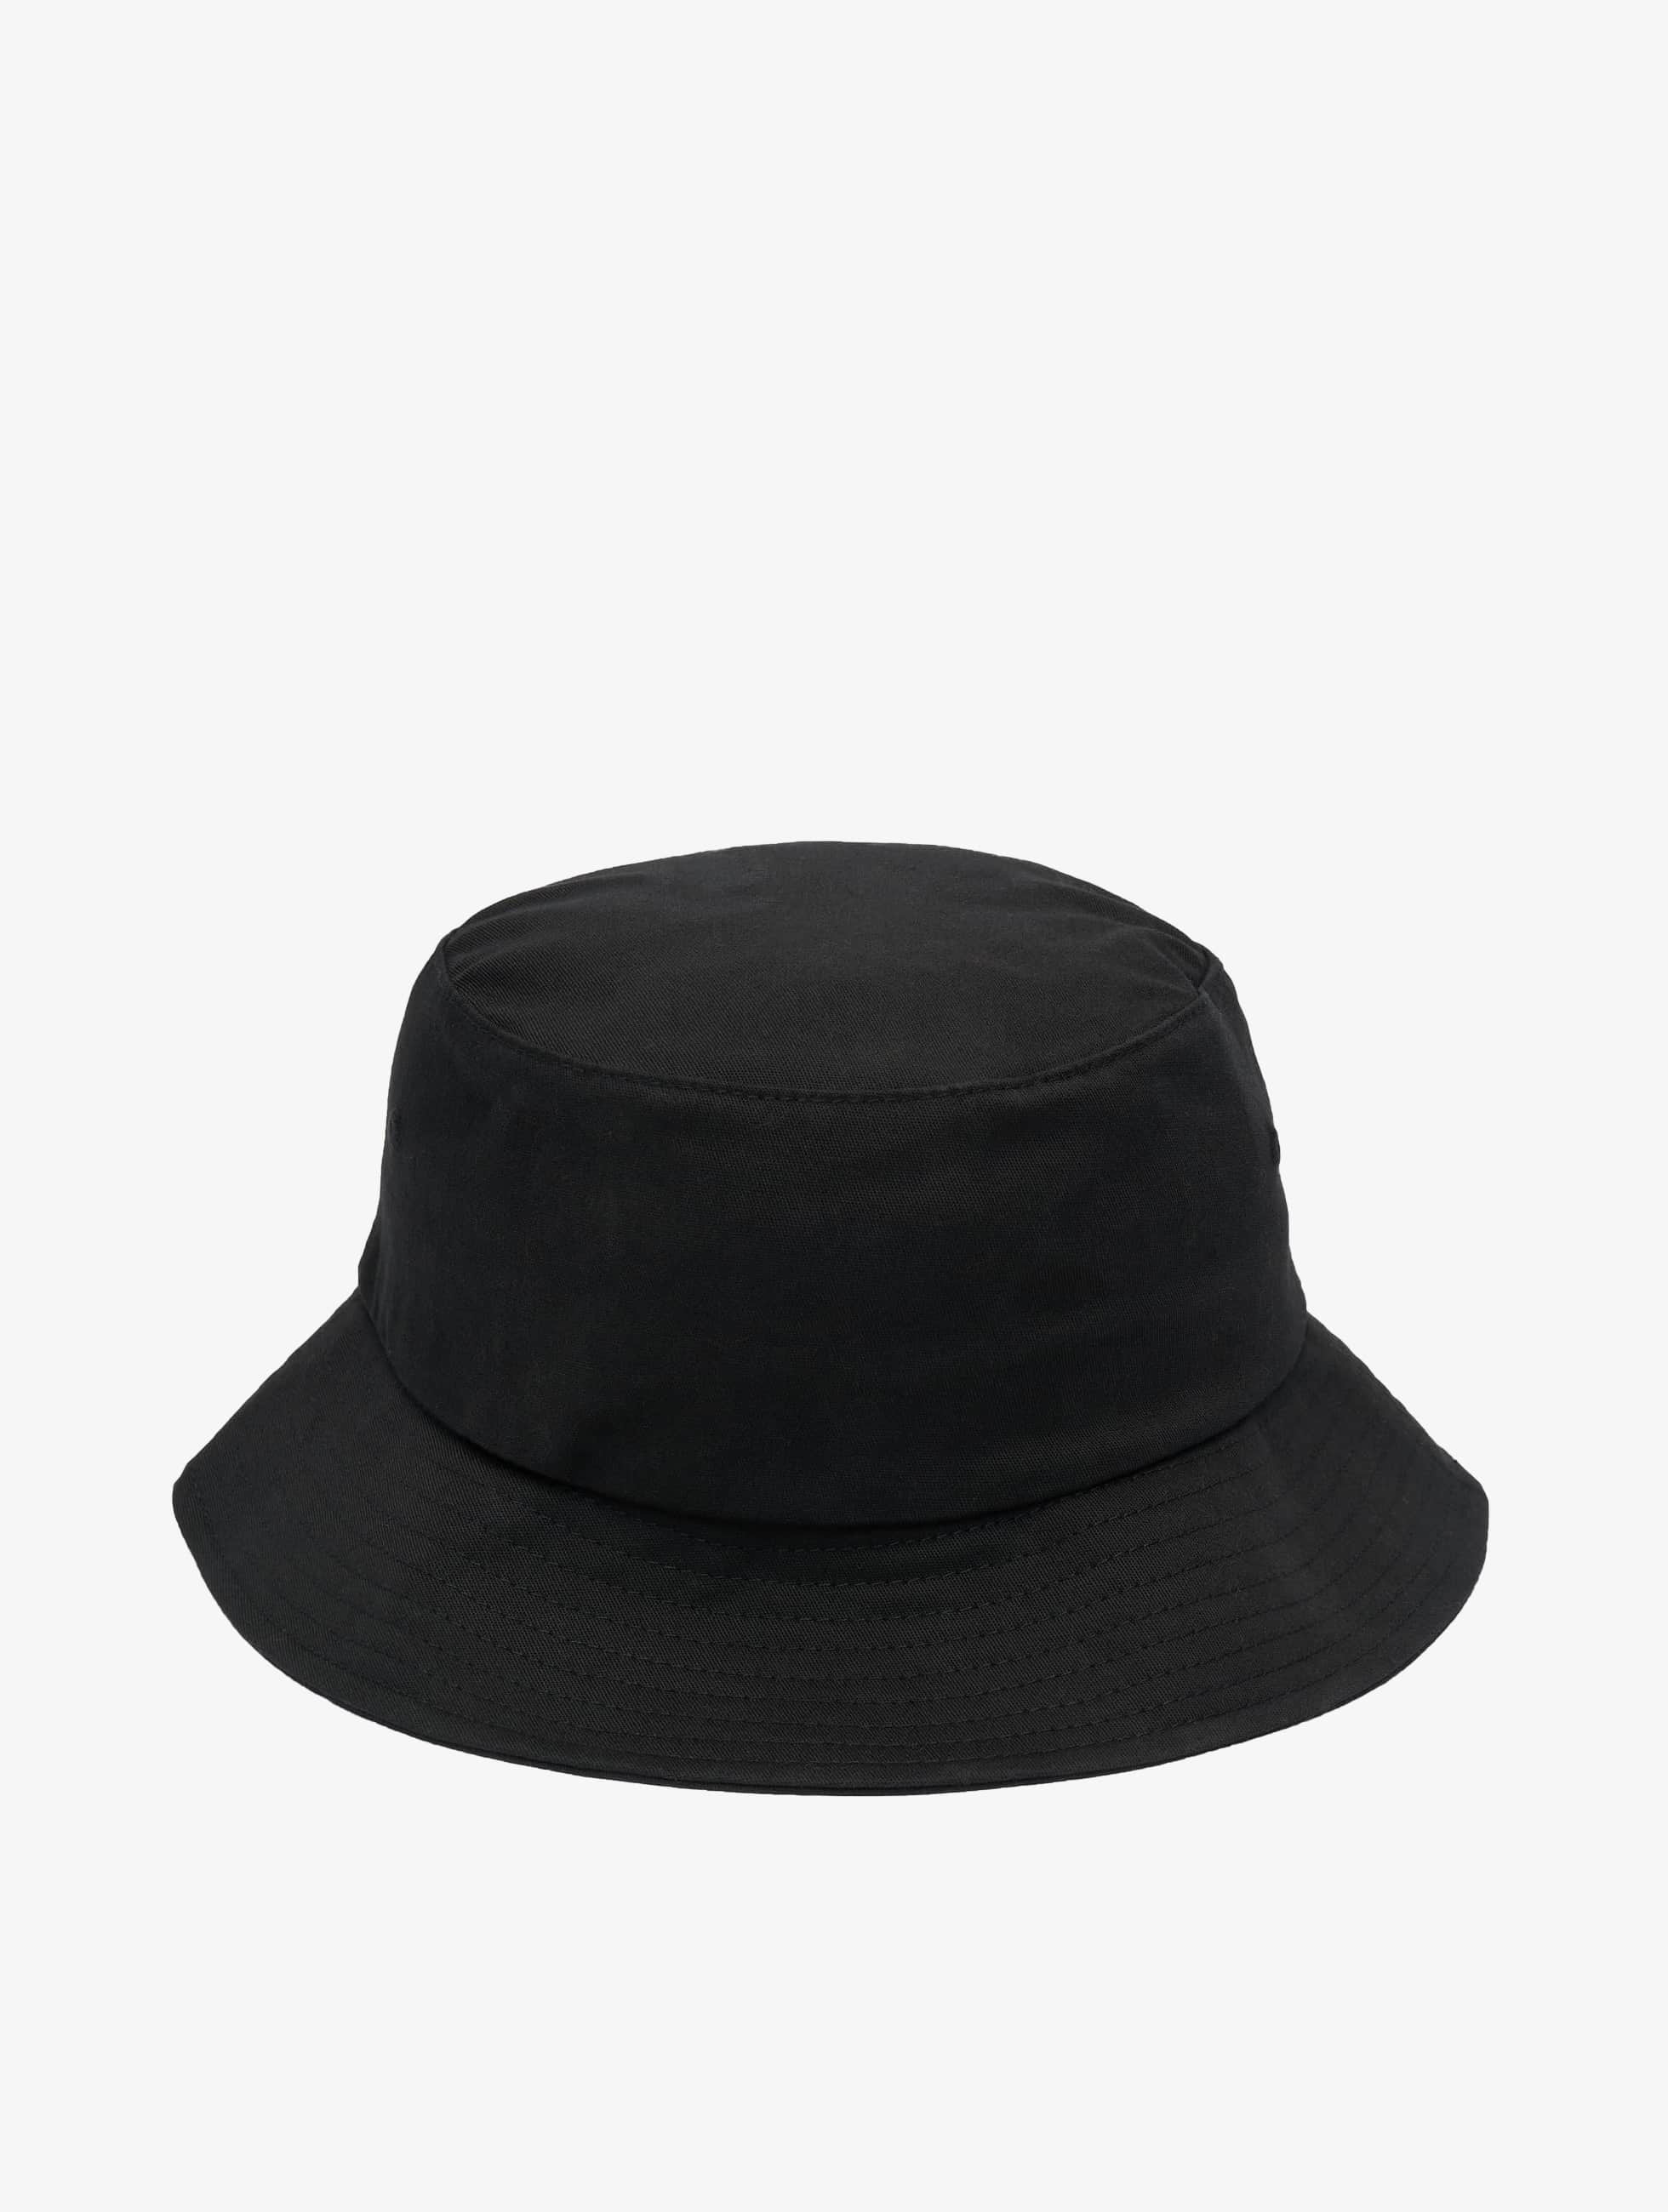 Flexfit Шляпа Cotton Twill черный